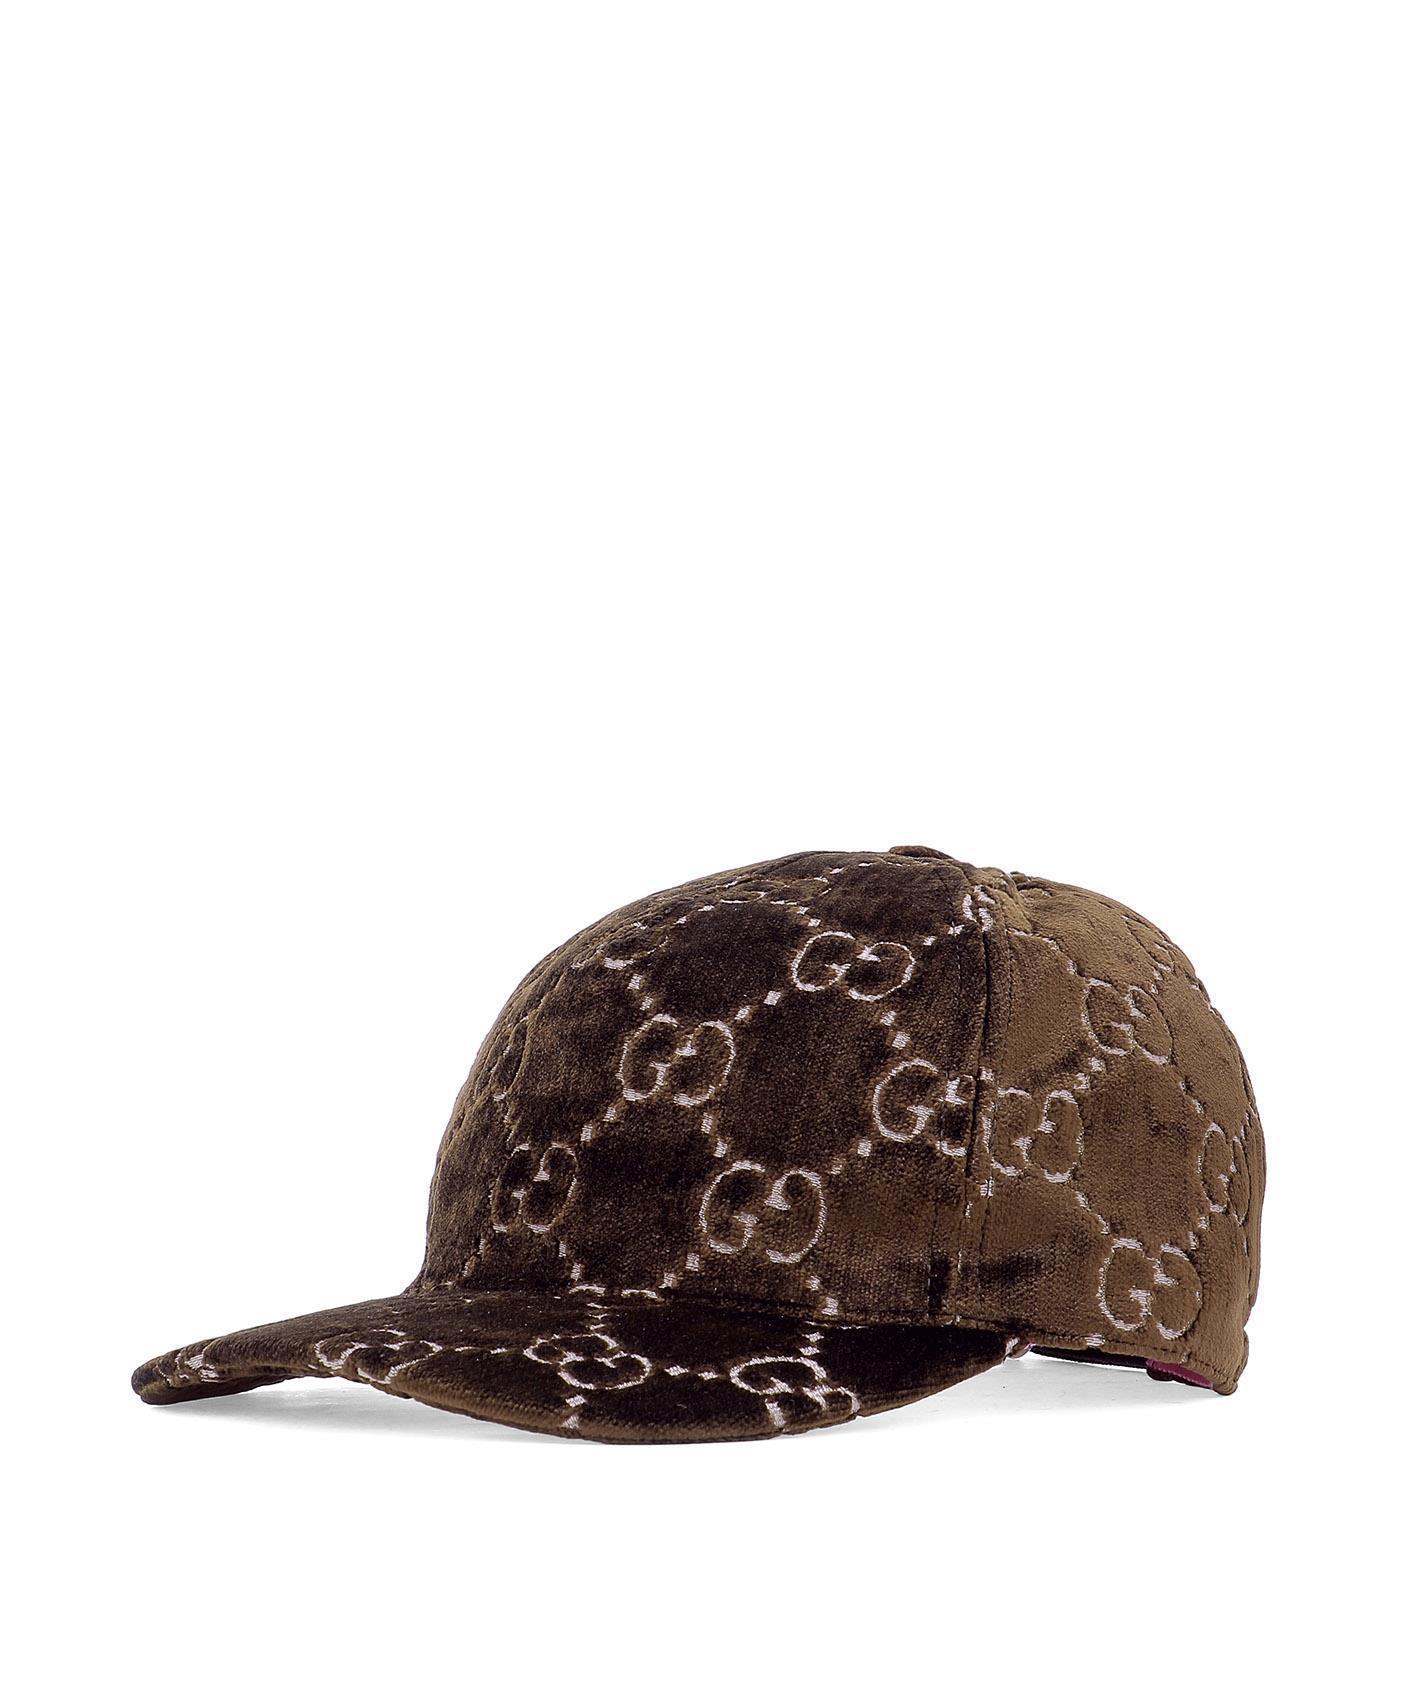 354b1db15fbbc Gucci Gg Supreme Velvet Snapback Hat in Brown for Men - Lyst